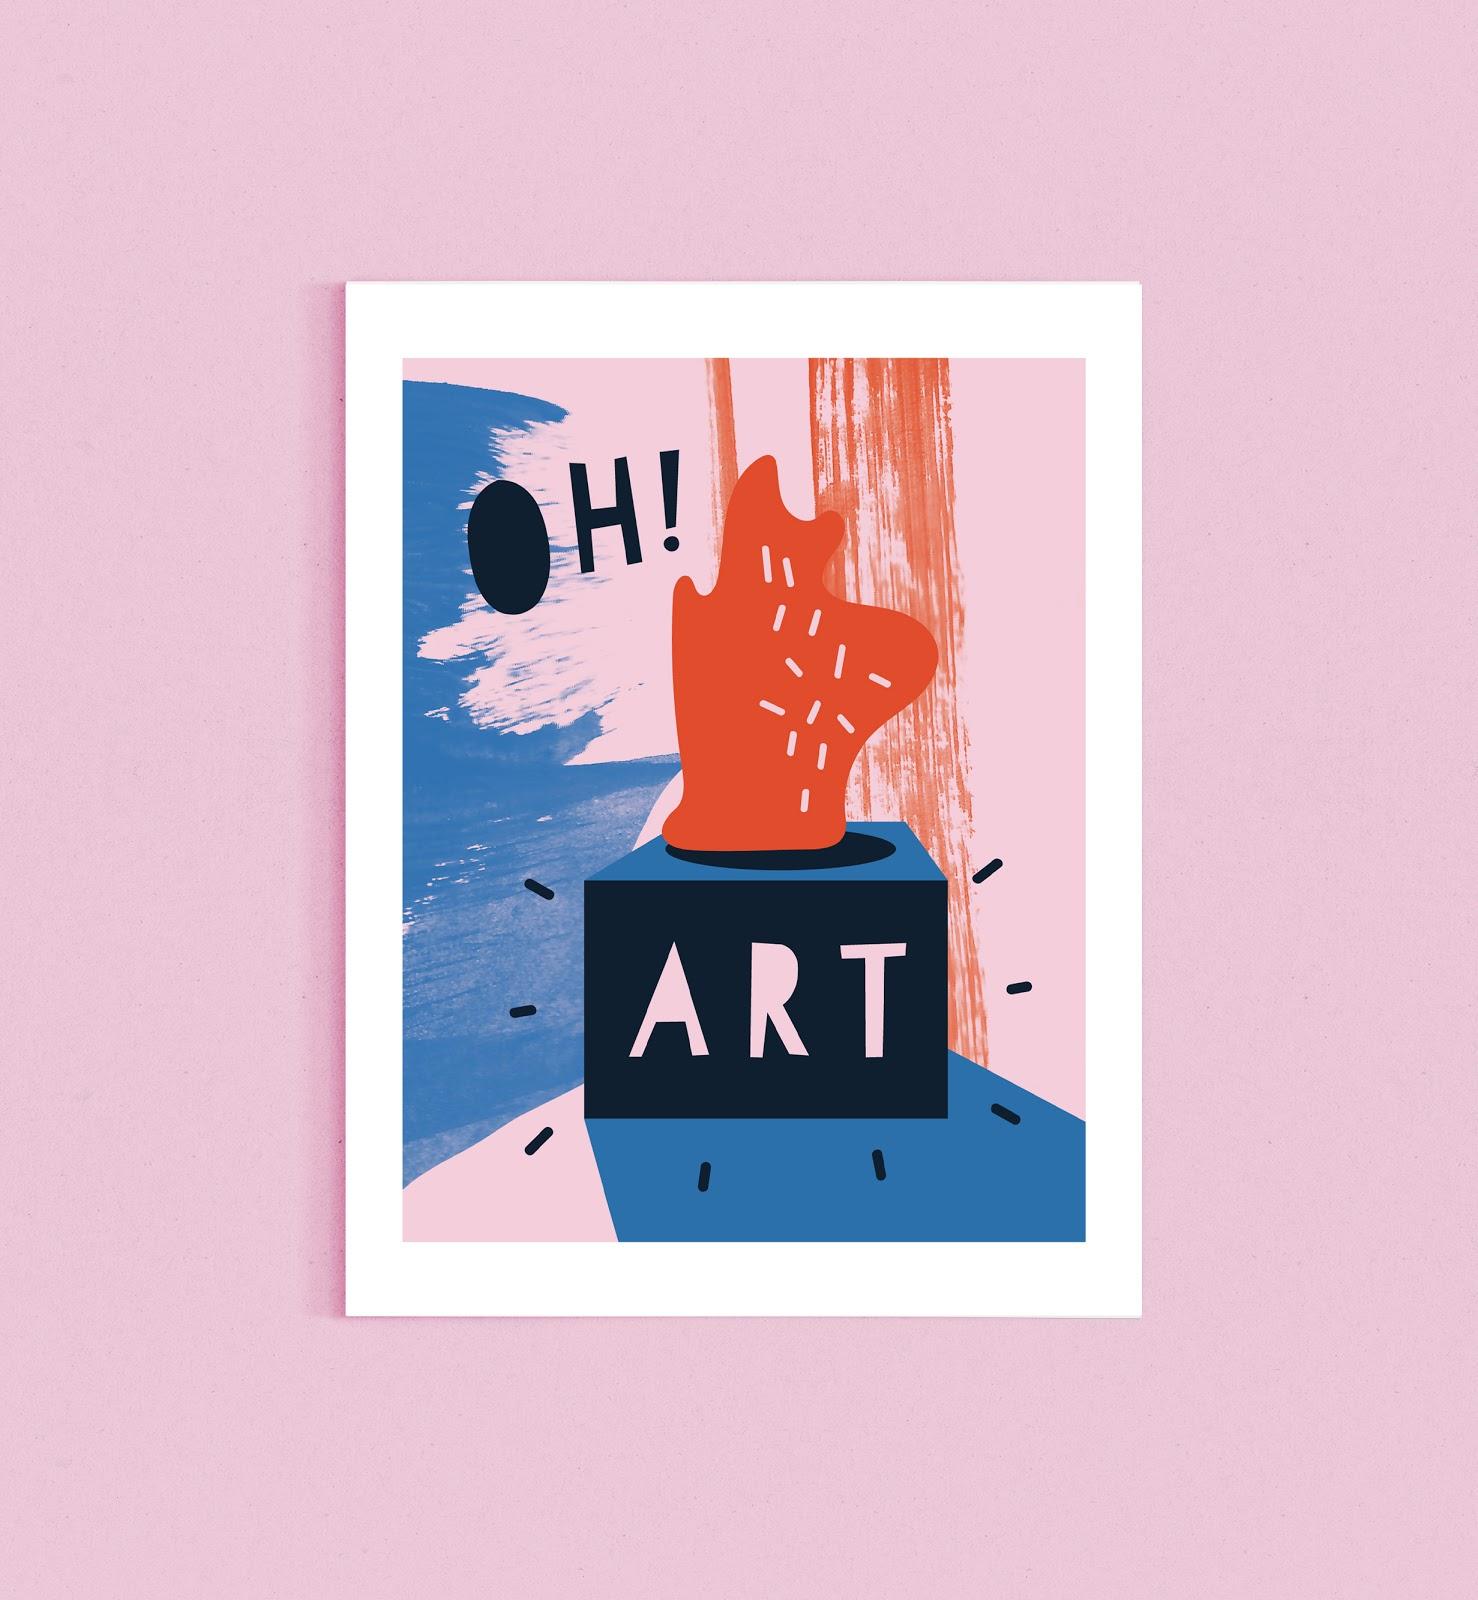 Illustration by Elisabetta Vedovato